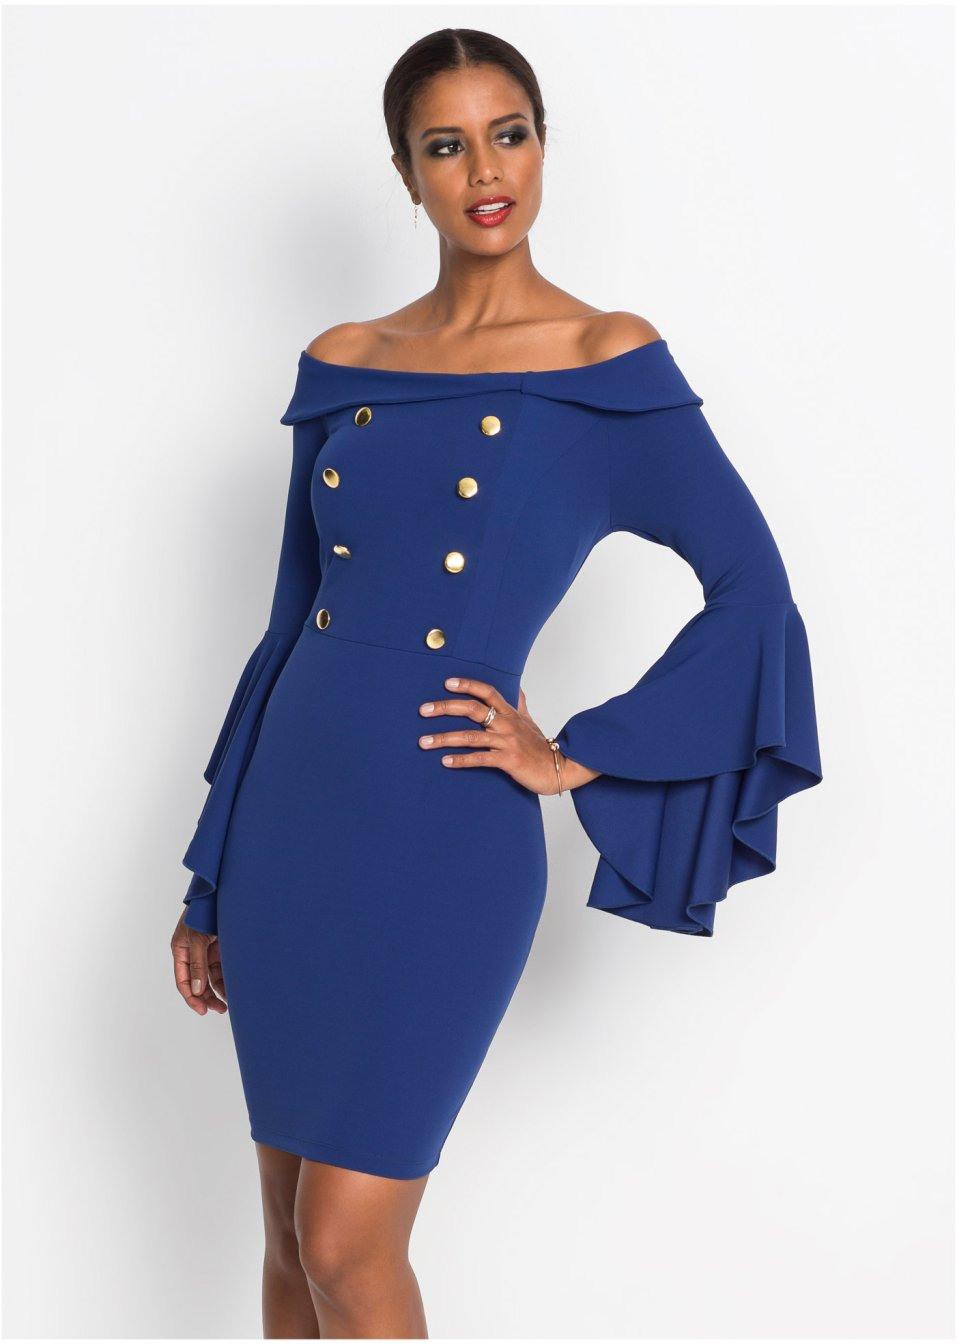 Carmenkleid Mitternachtsblau  Damen  Bodyflirt Boutique